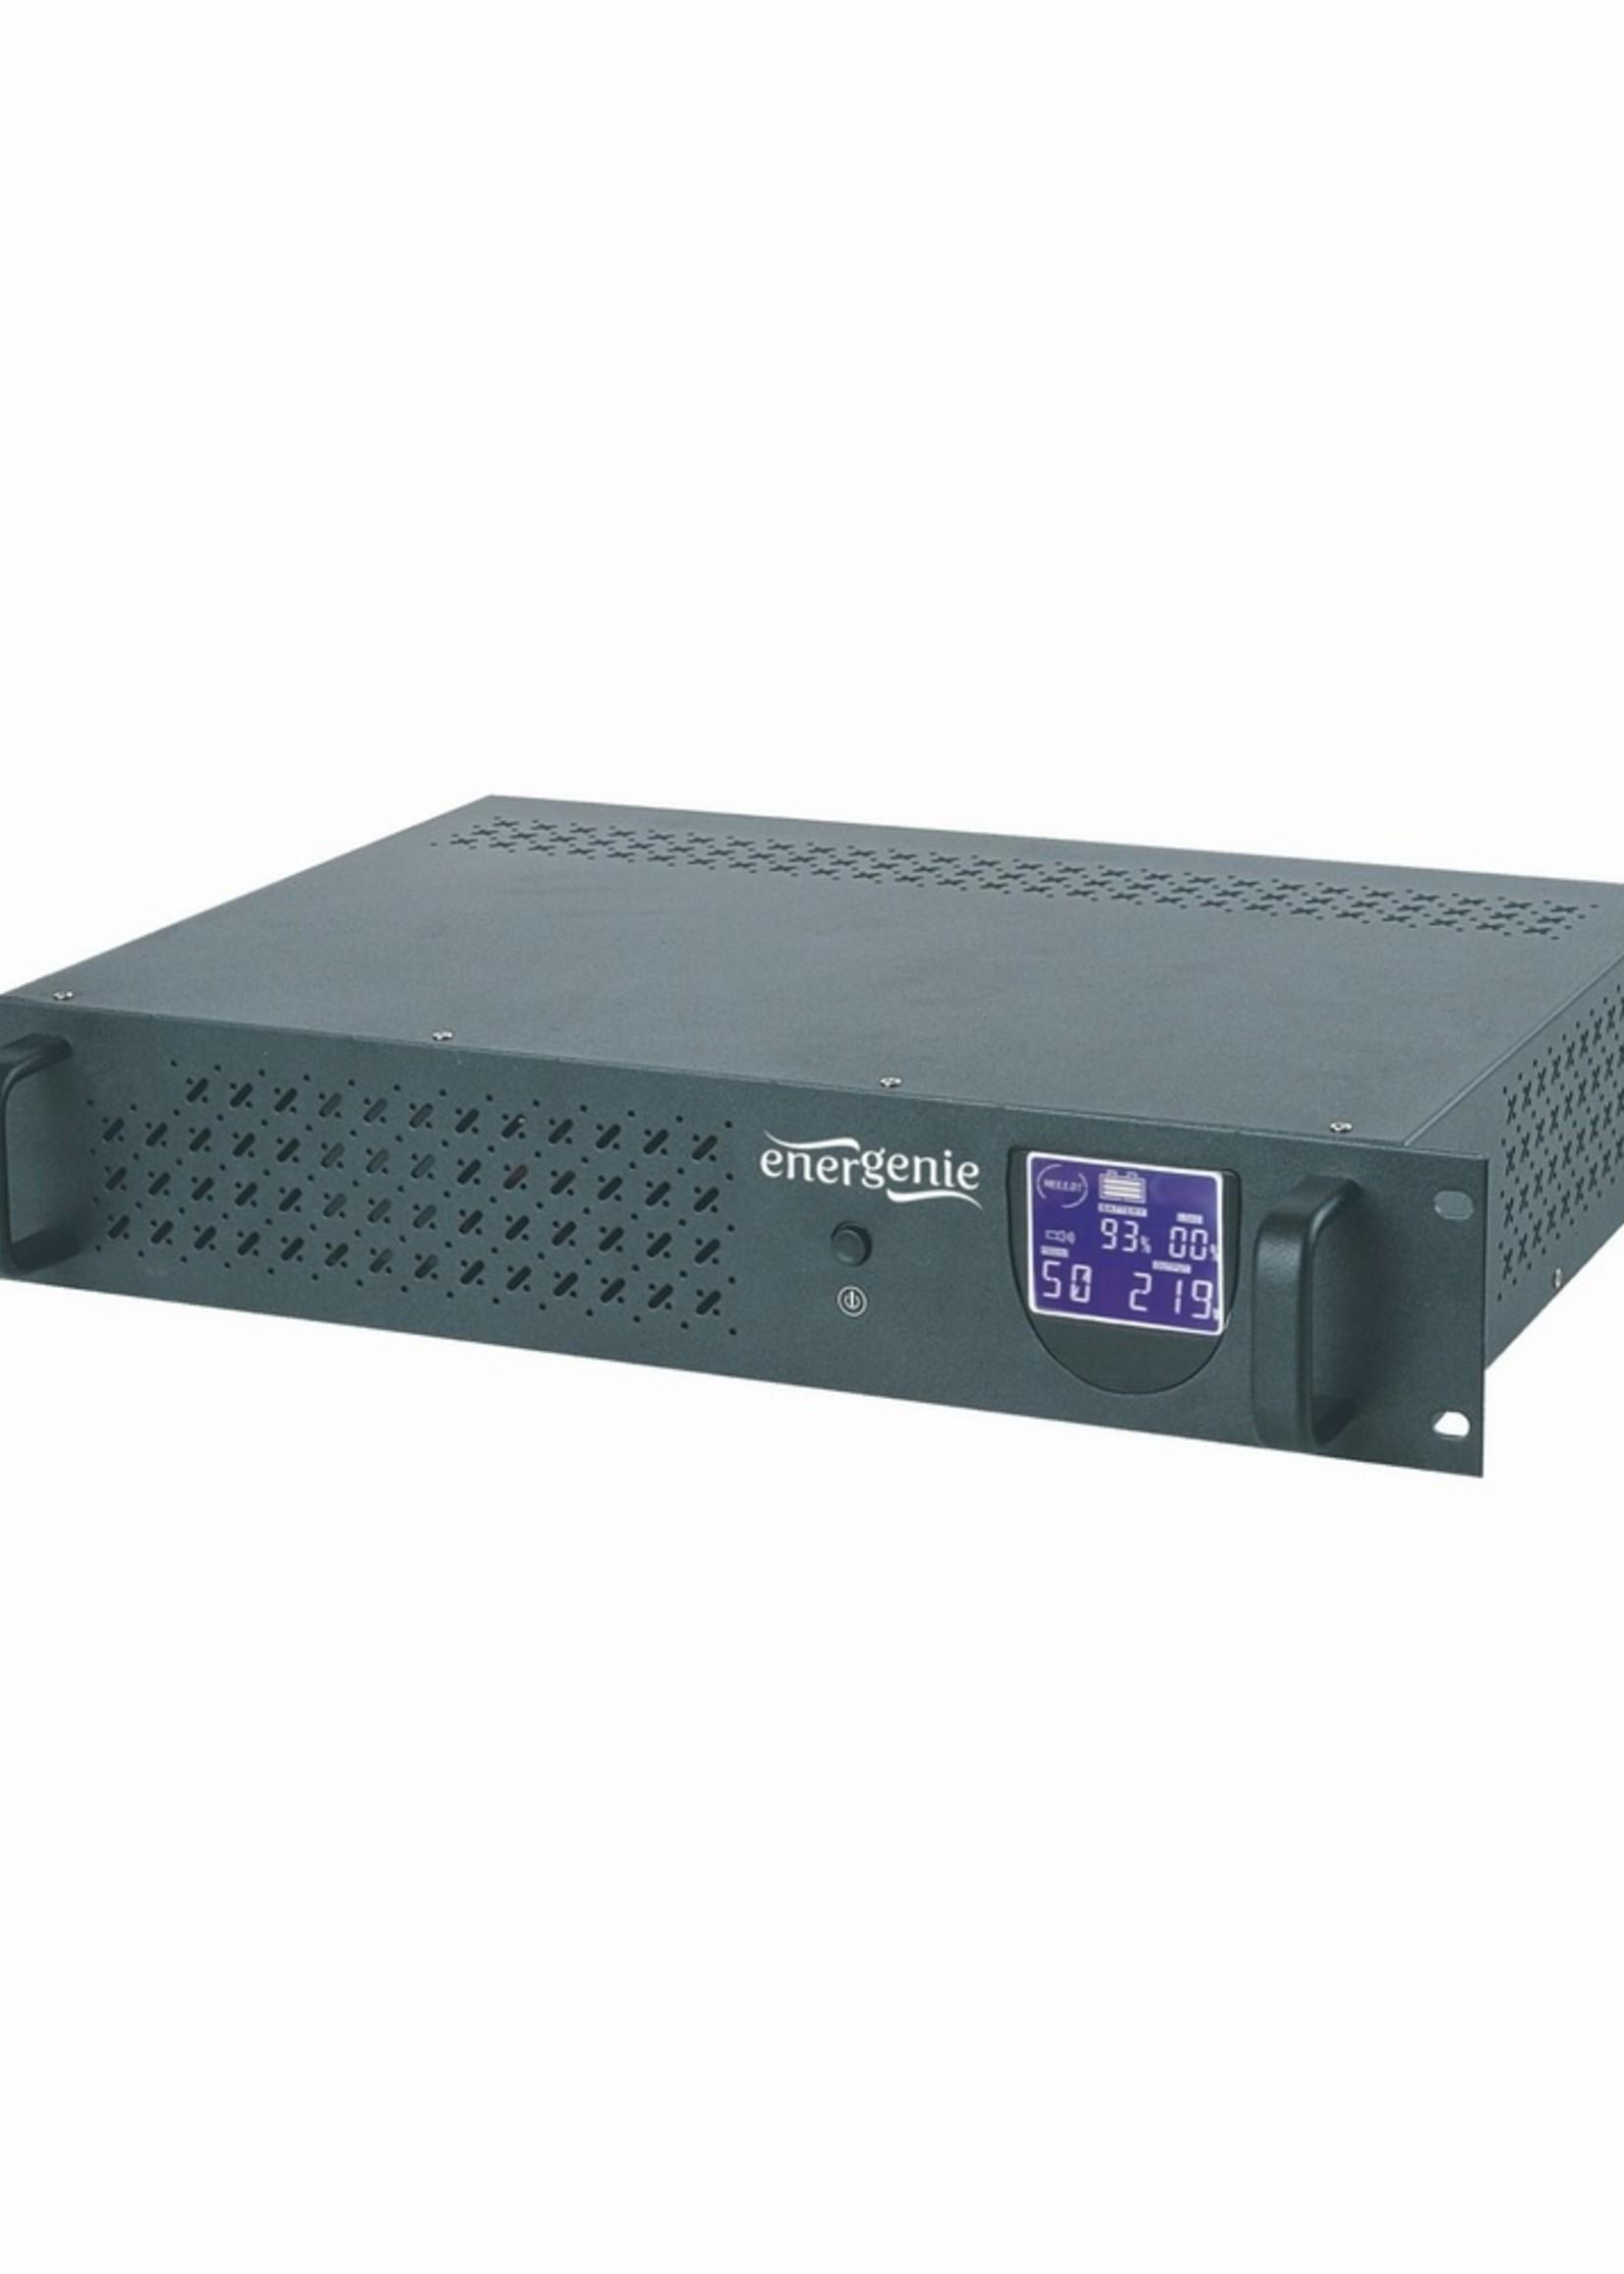 EnerGenie UPS rack 1500VA